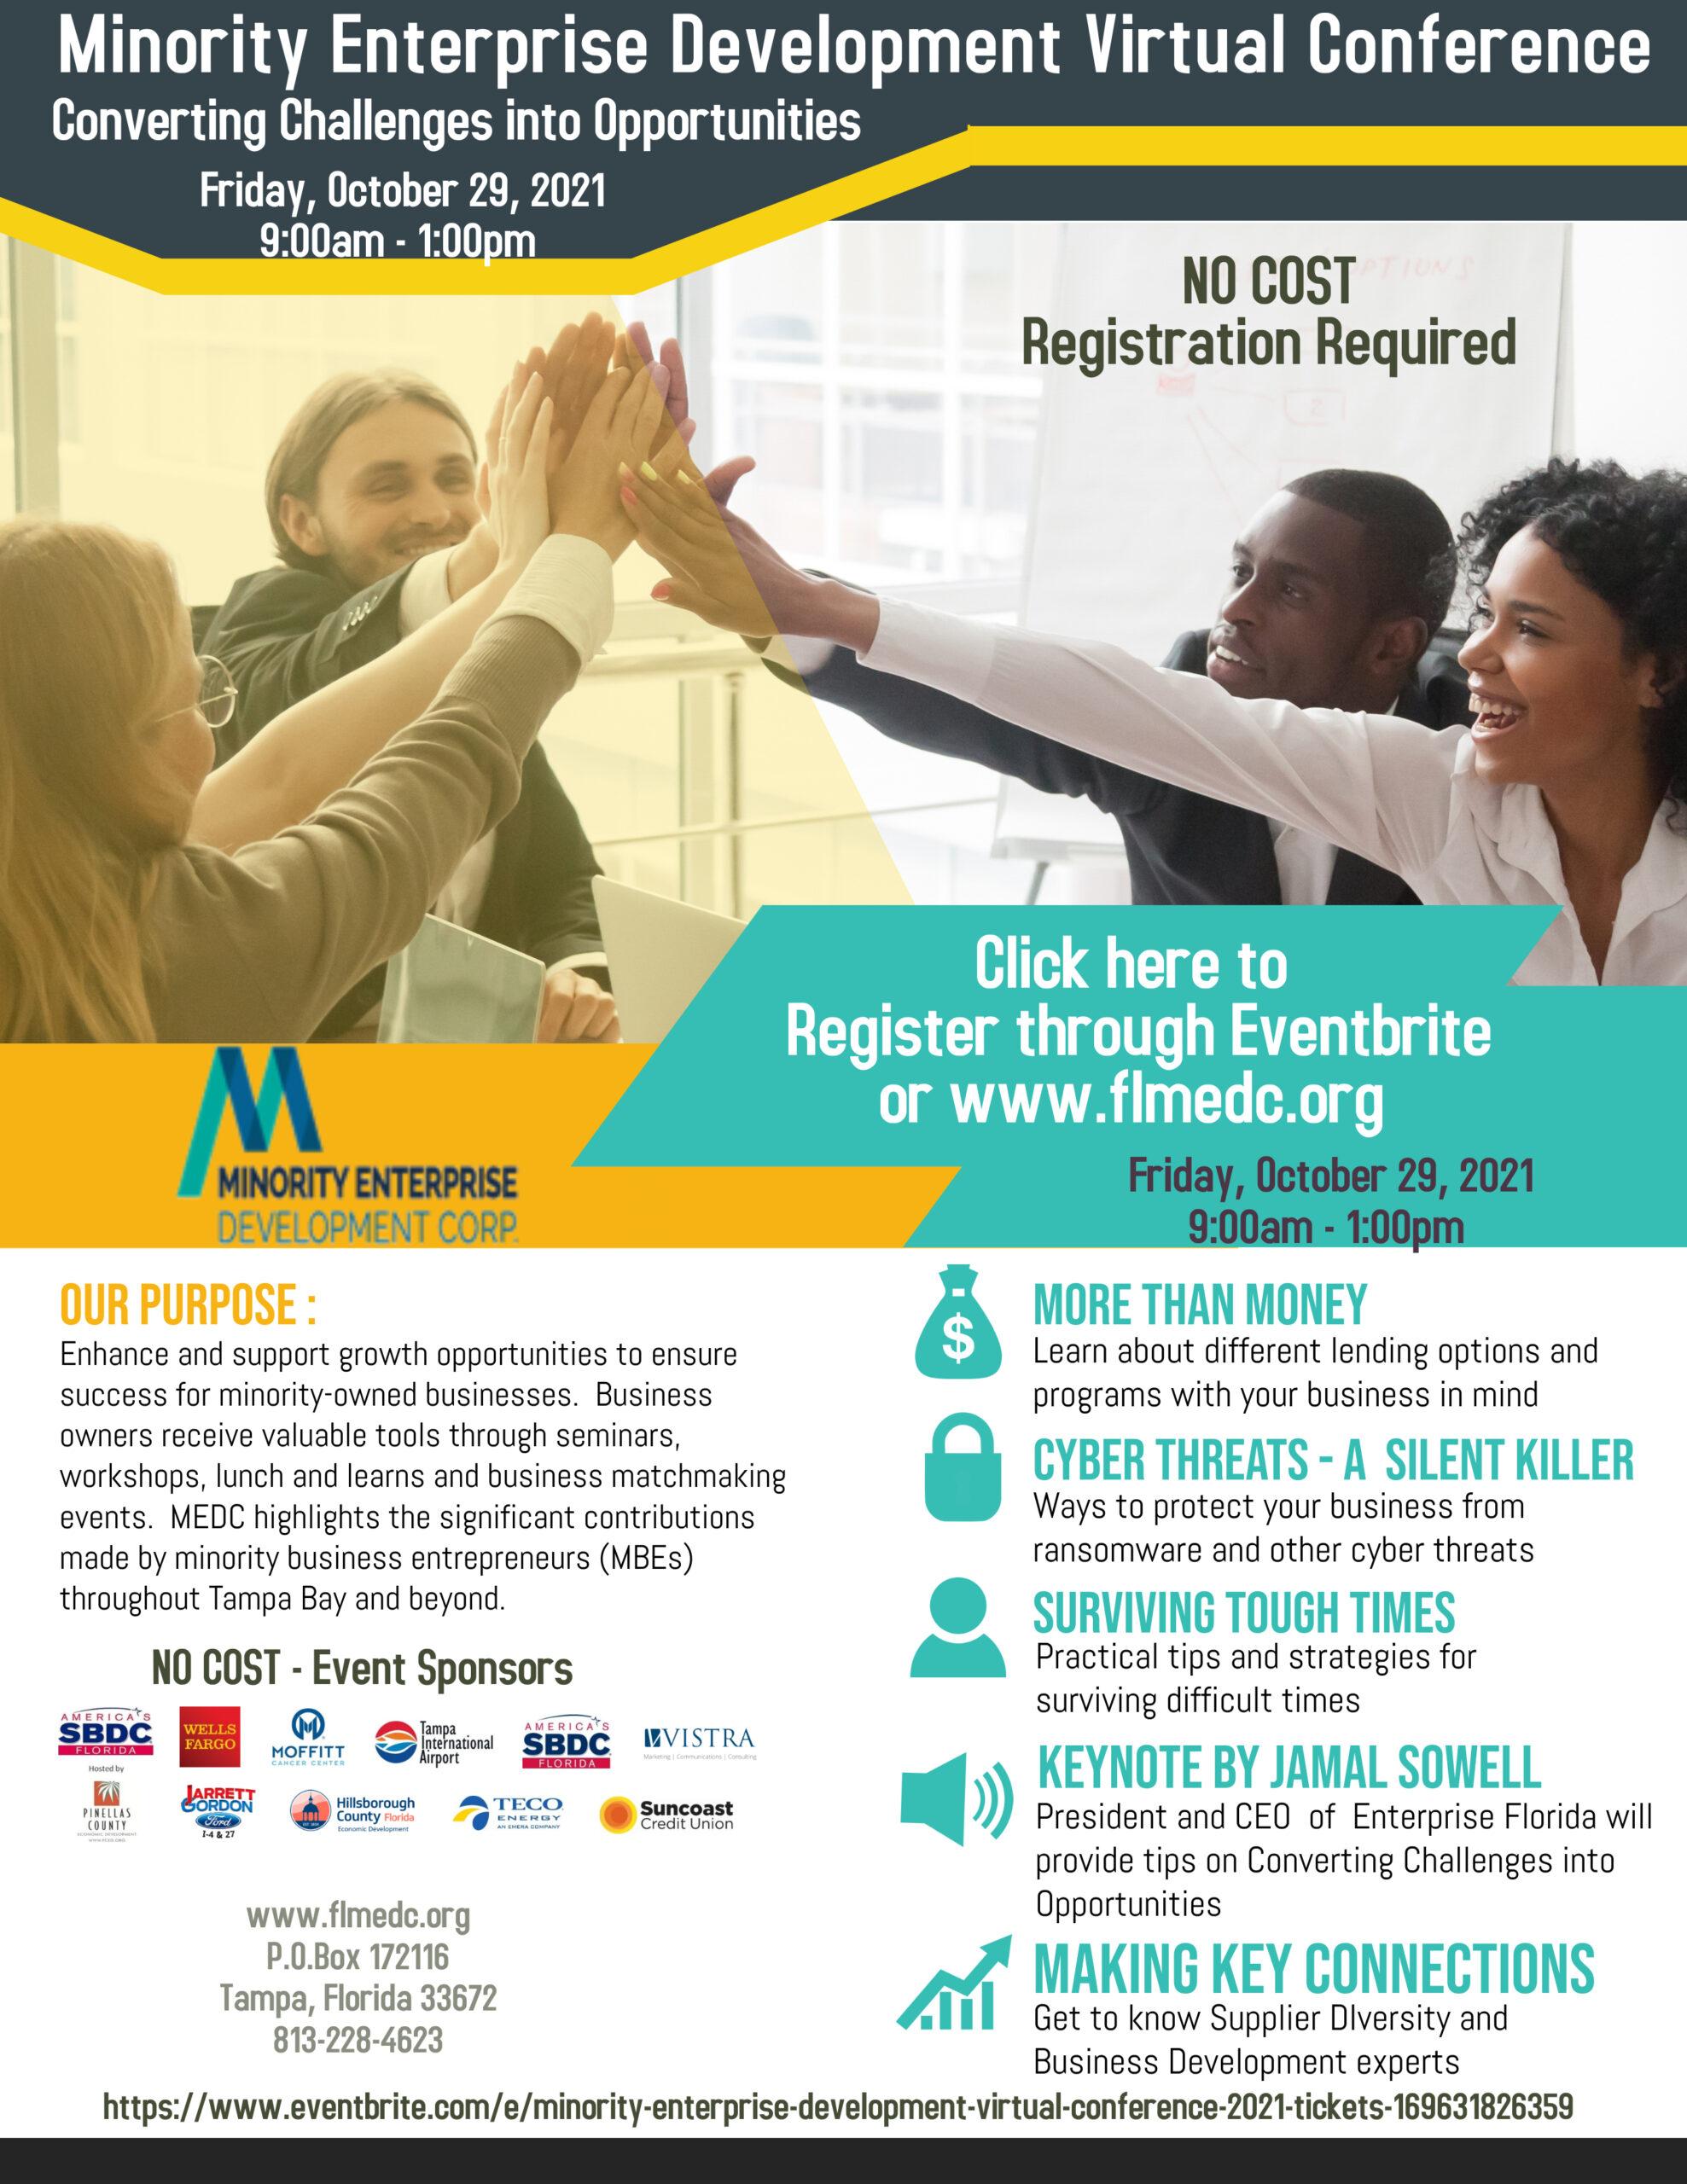 Minority Enterprise Development Virtual Conference 2021-10-29